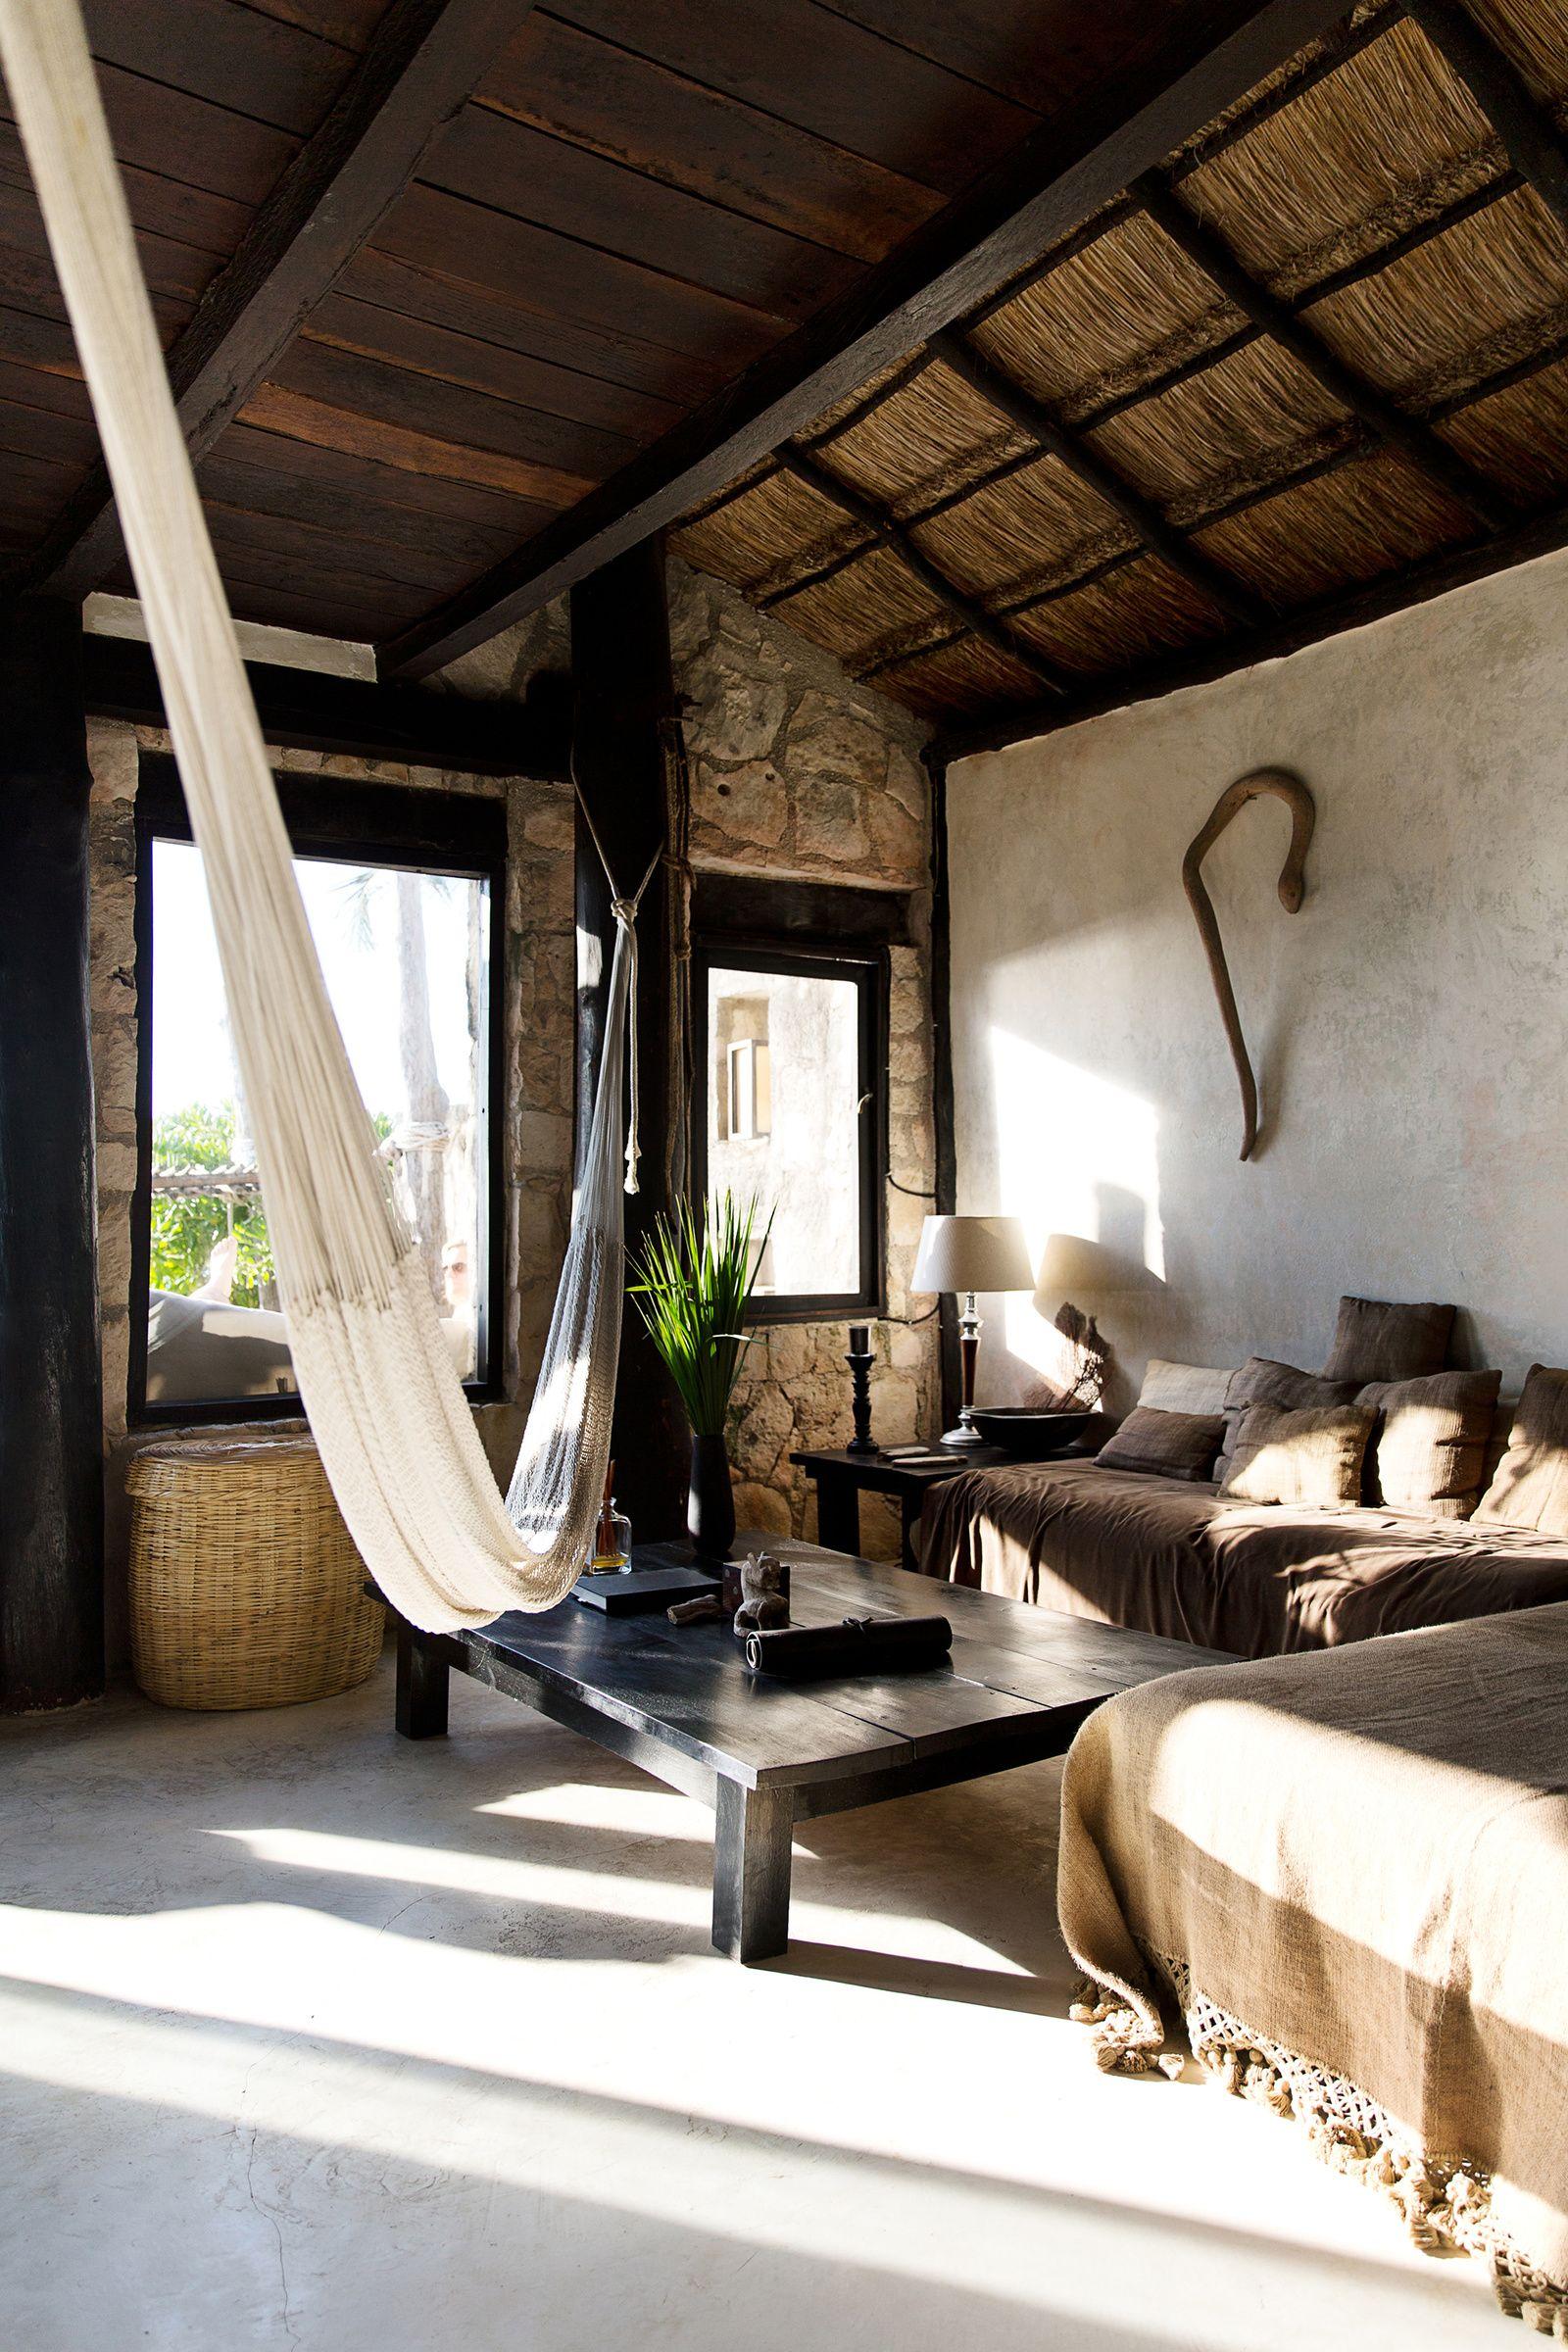 Coqui coqui tulum mexico retail design architecture - How do you say living room in spanish ...